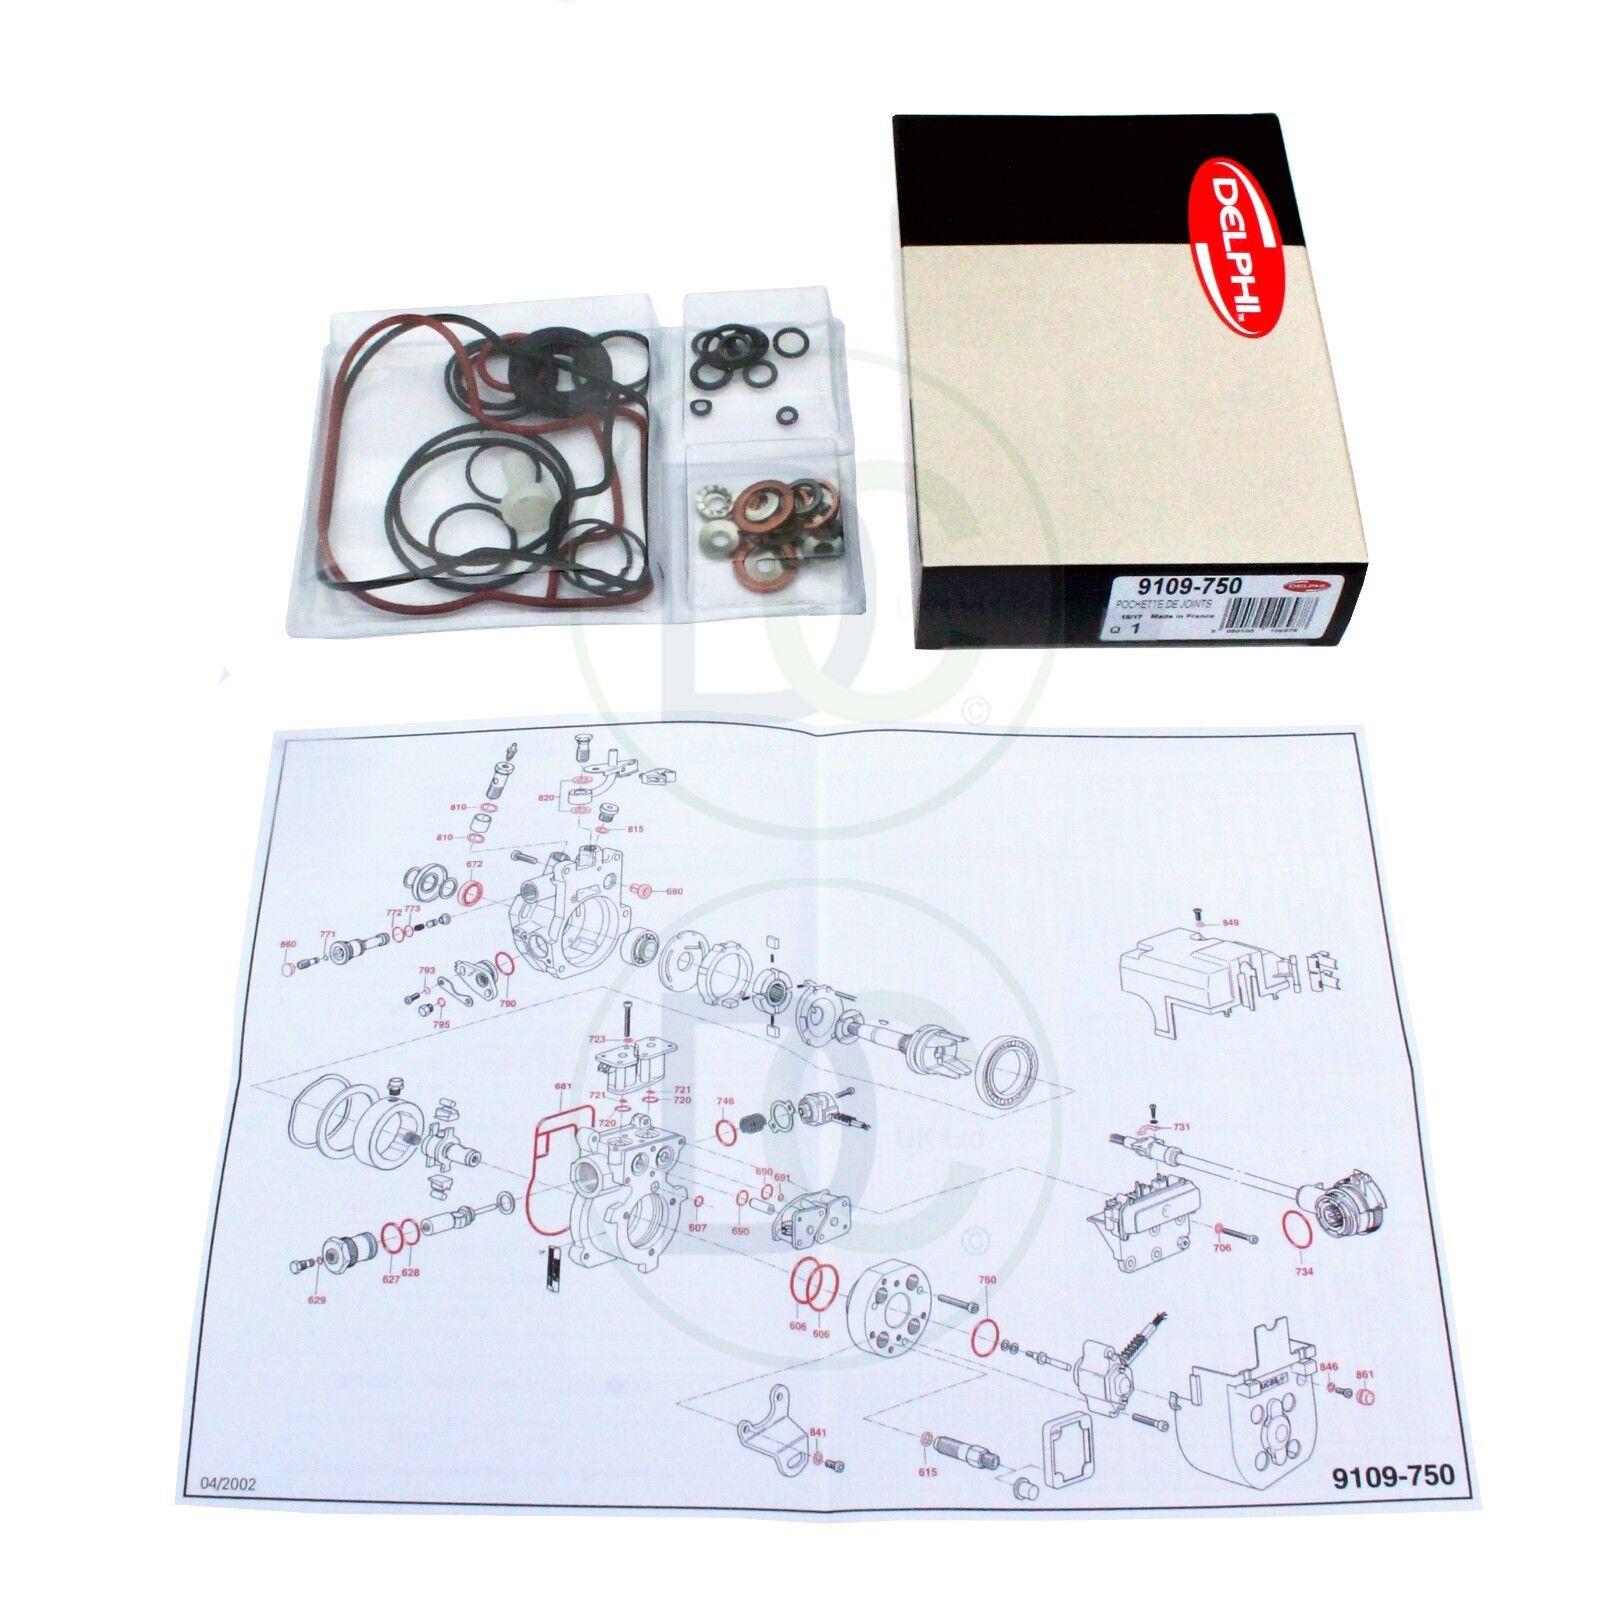 Gasket Kit for CAV Delphi Lucas-Epic-Diesel injection pump en Mercedes...